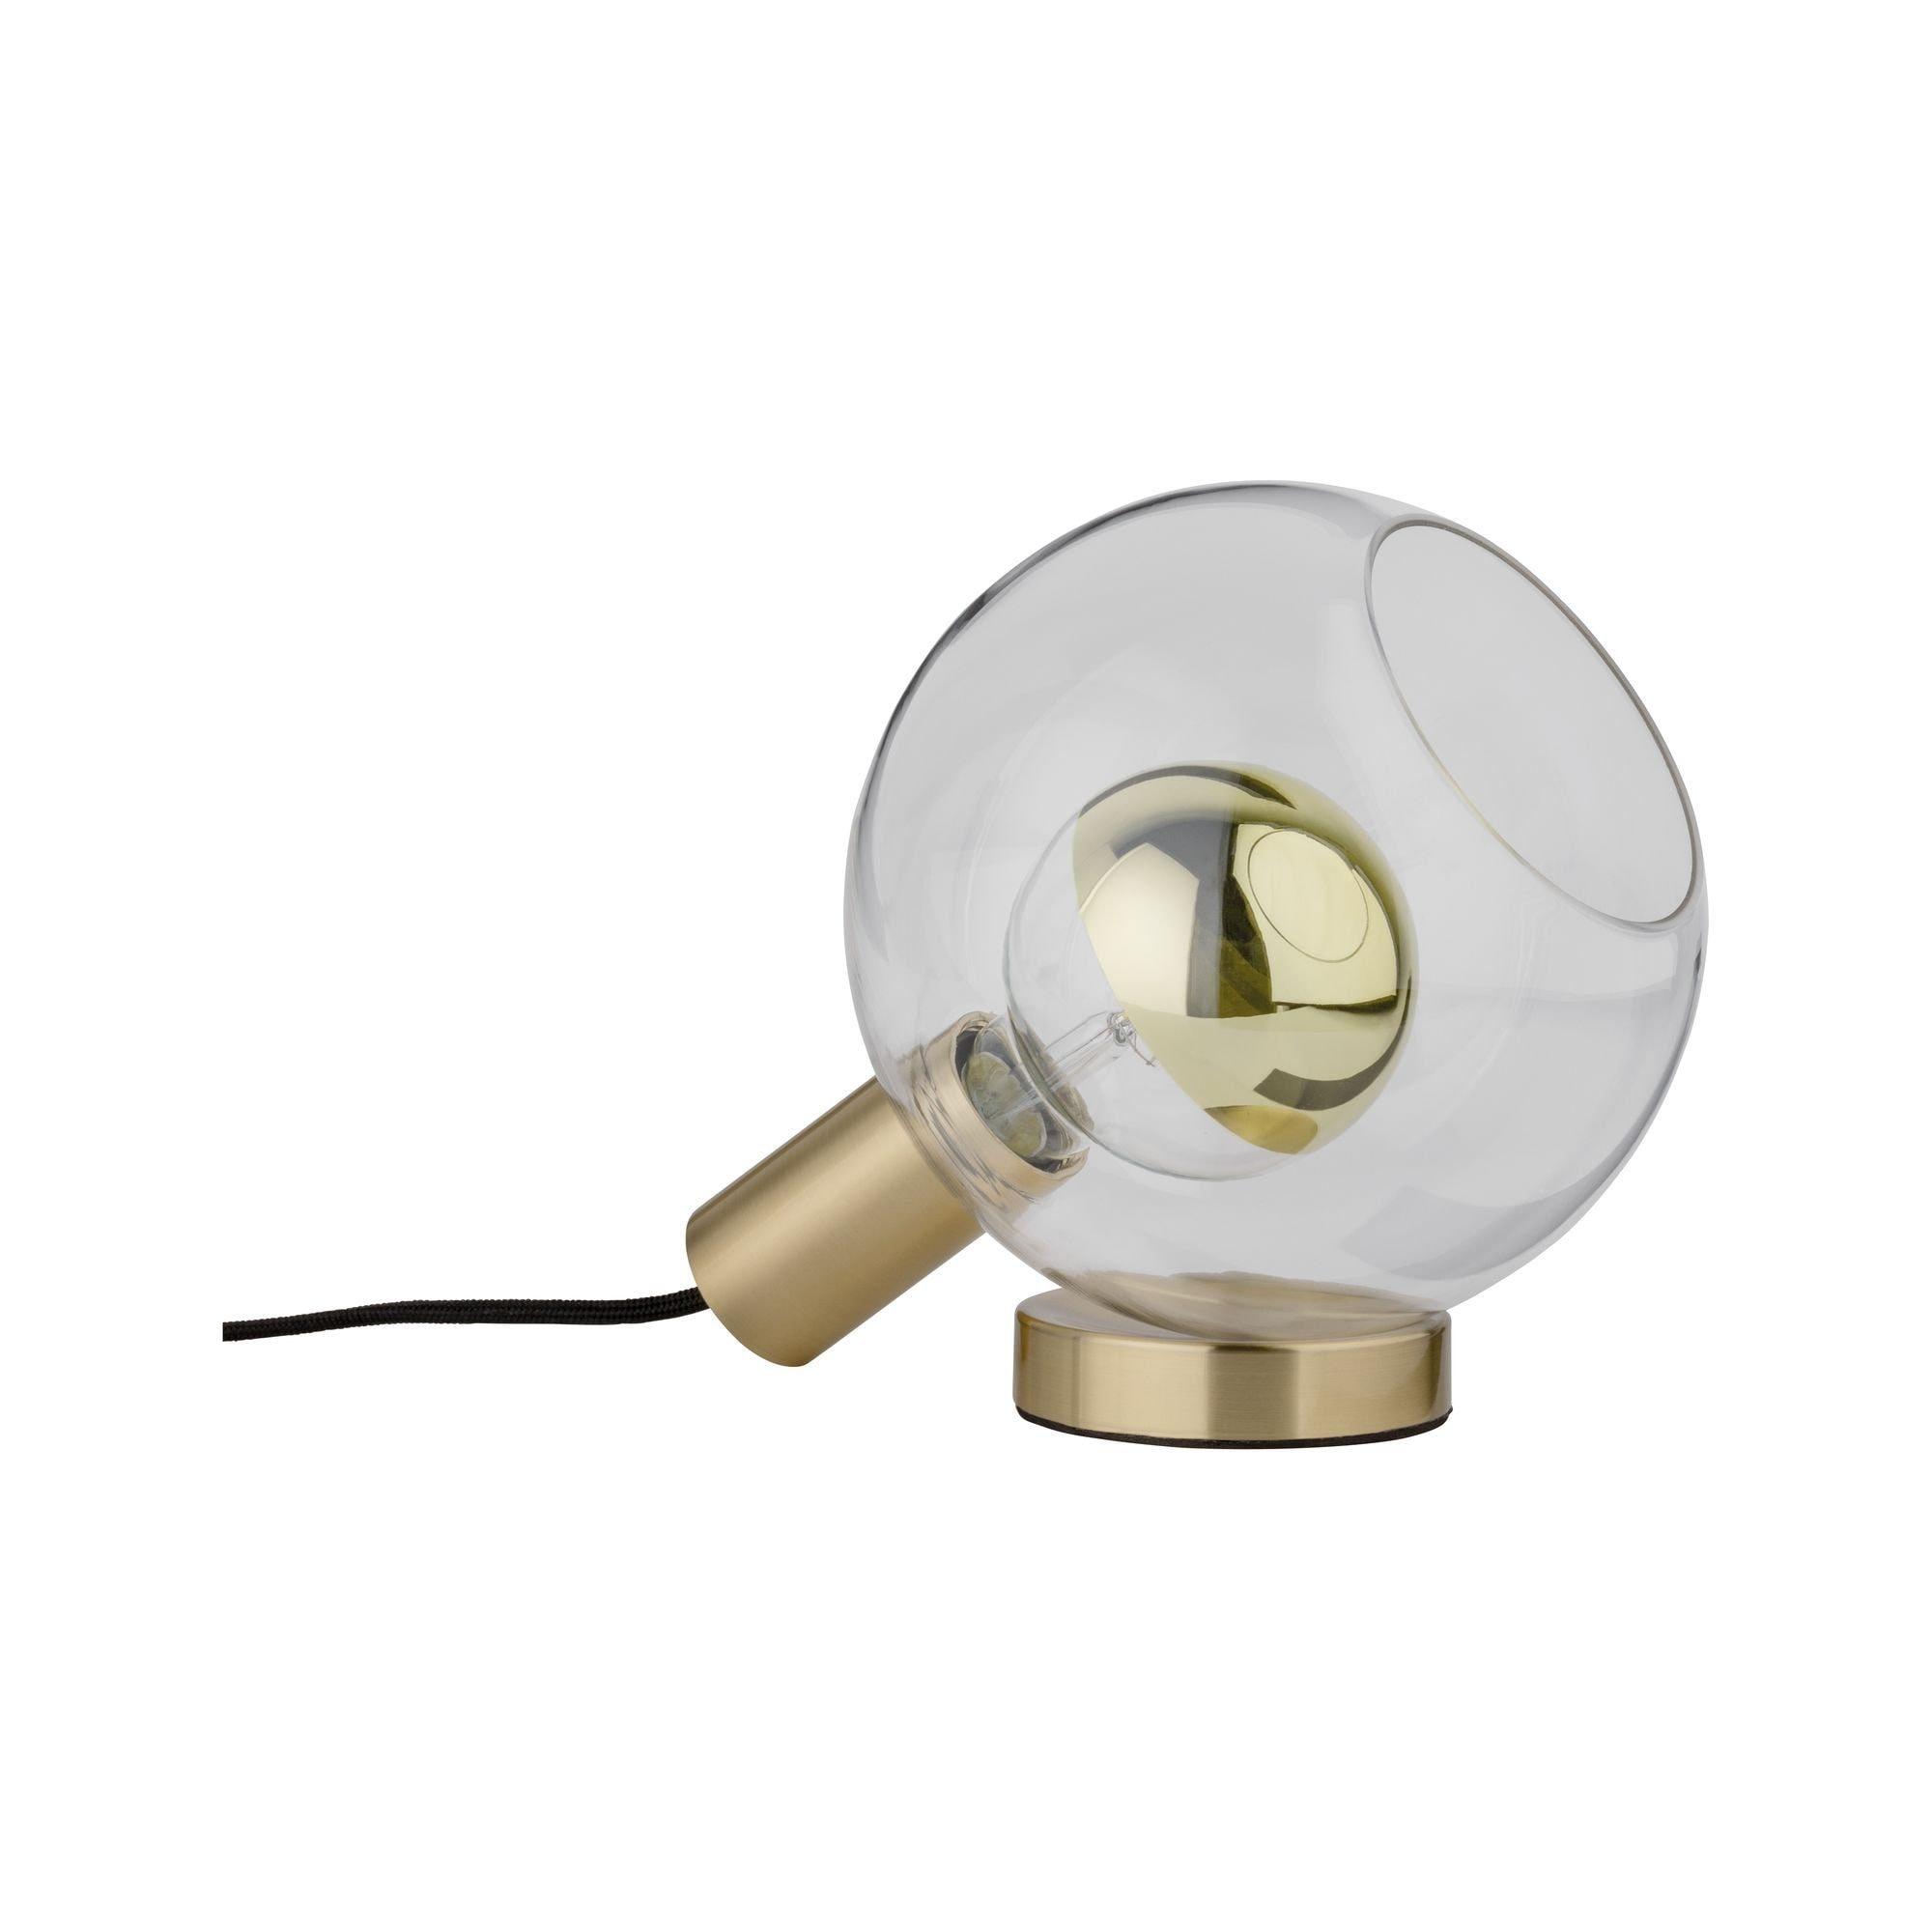 Paulmann,LED Tischleuchte Esben Klarglas/Messing gebürstet max. 20W E27